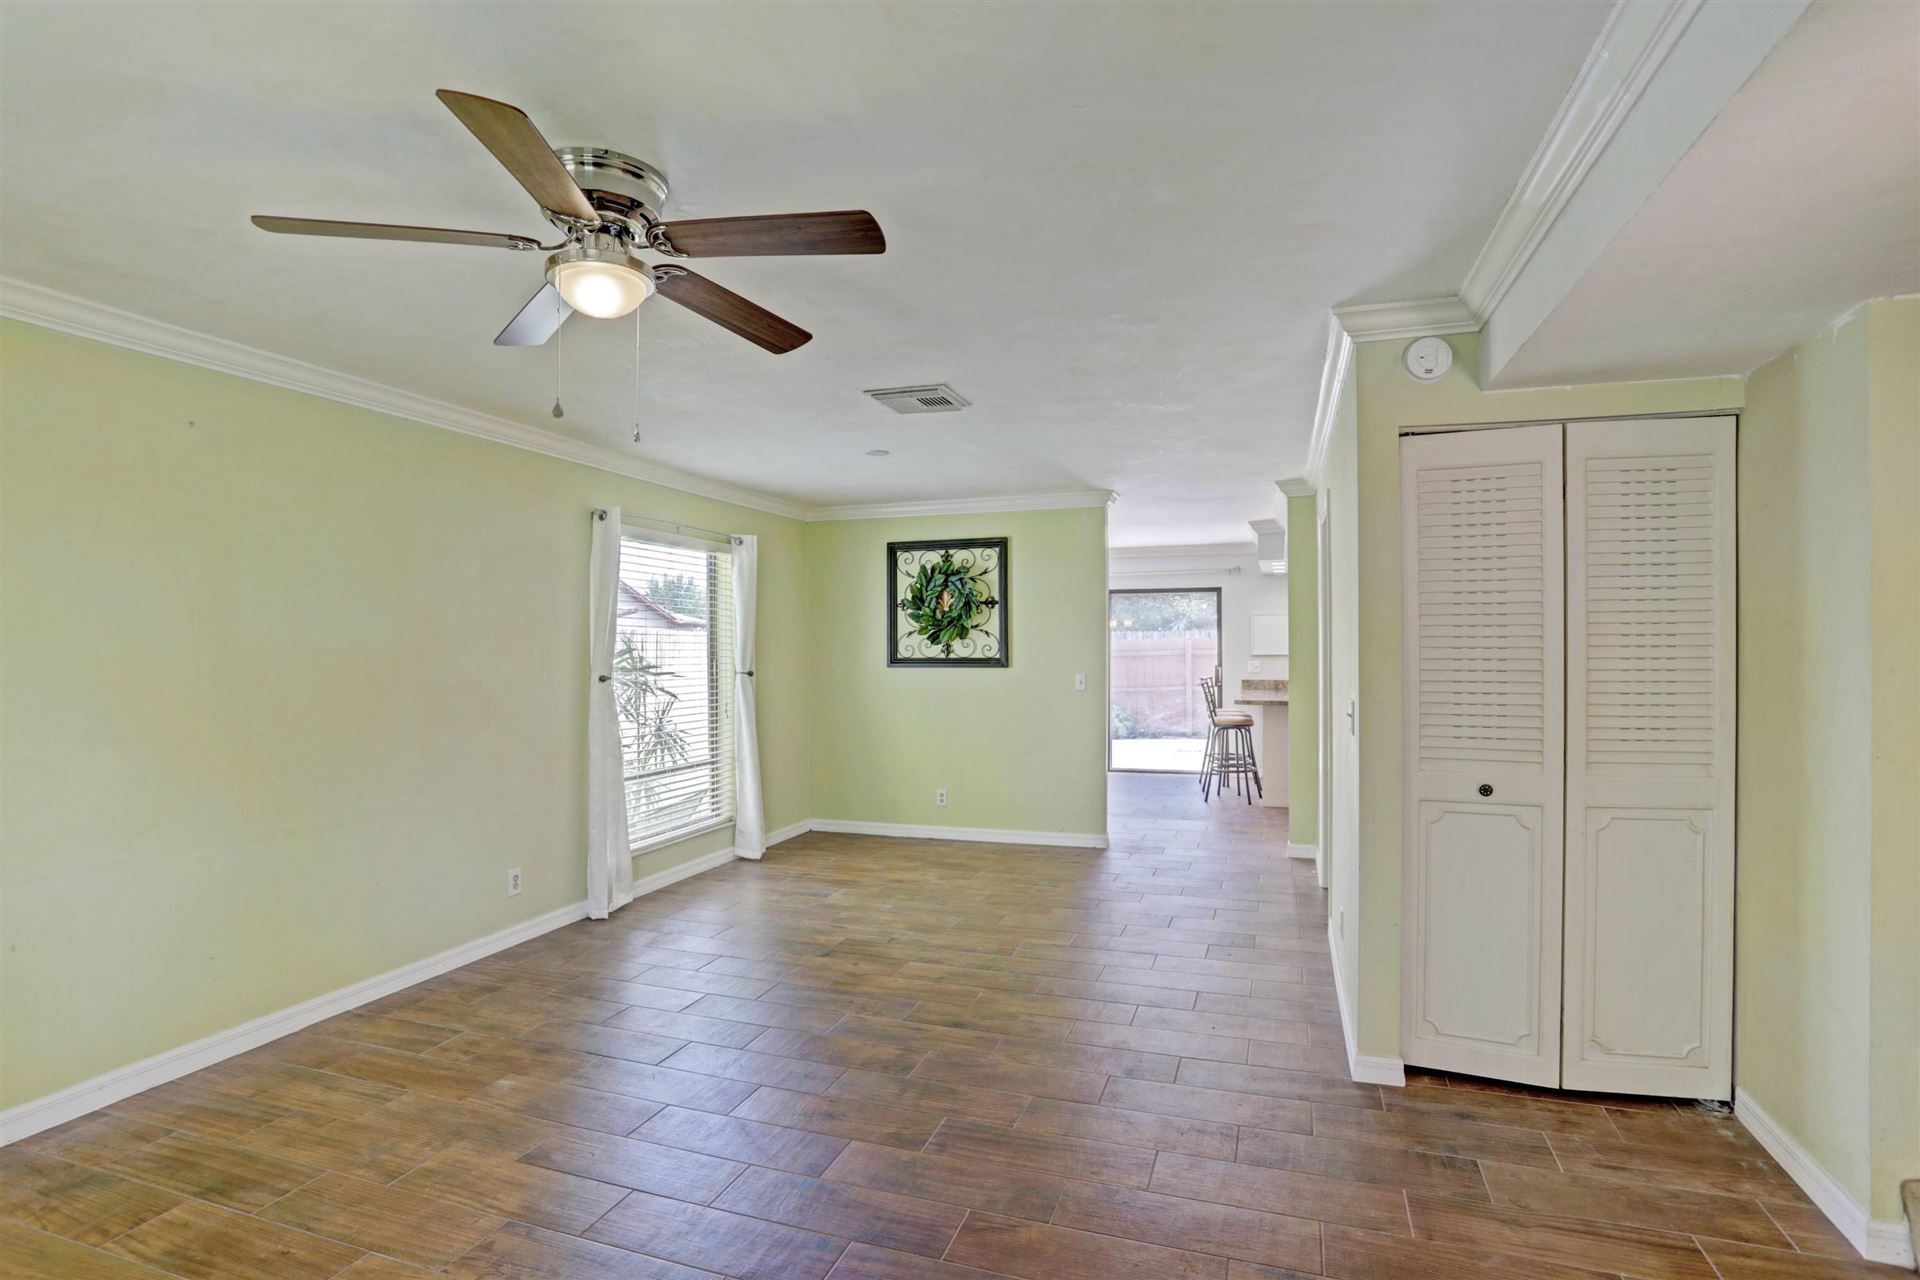 912 Sandtree Drive, Palm Beach Gardens, FL 33403 - MLS#: RX-10715094